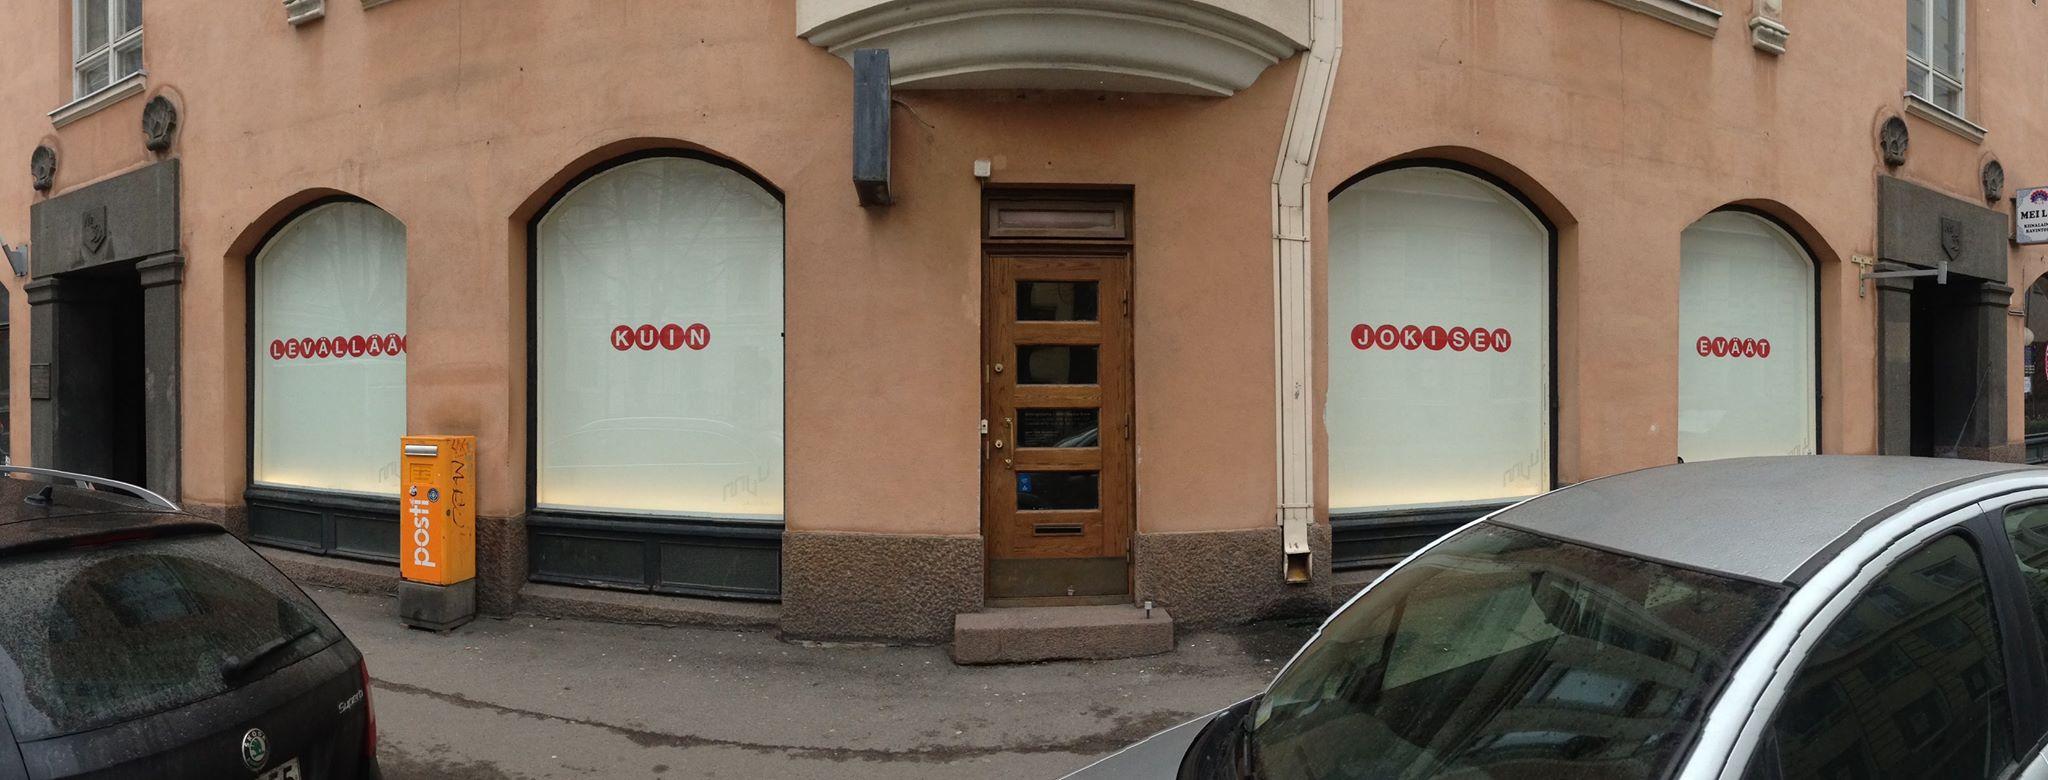 MUU_Gallery_Finland